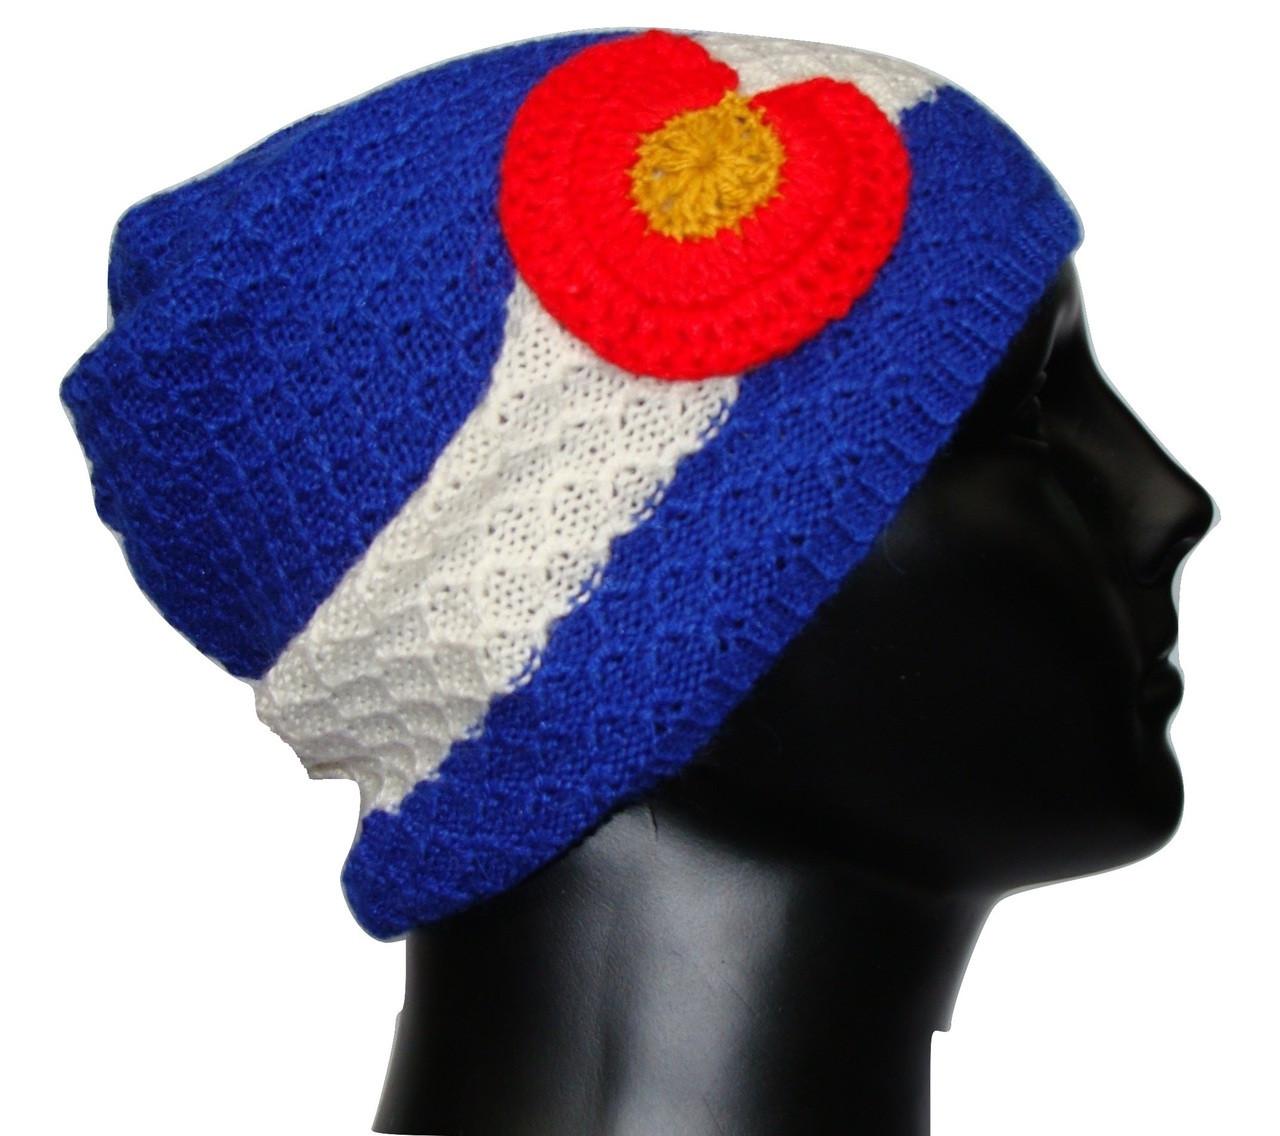 faf41cae Beanie Colorado Flag Hand Knit 100% Alpaca Artisan Made Fine Warm ...